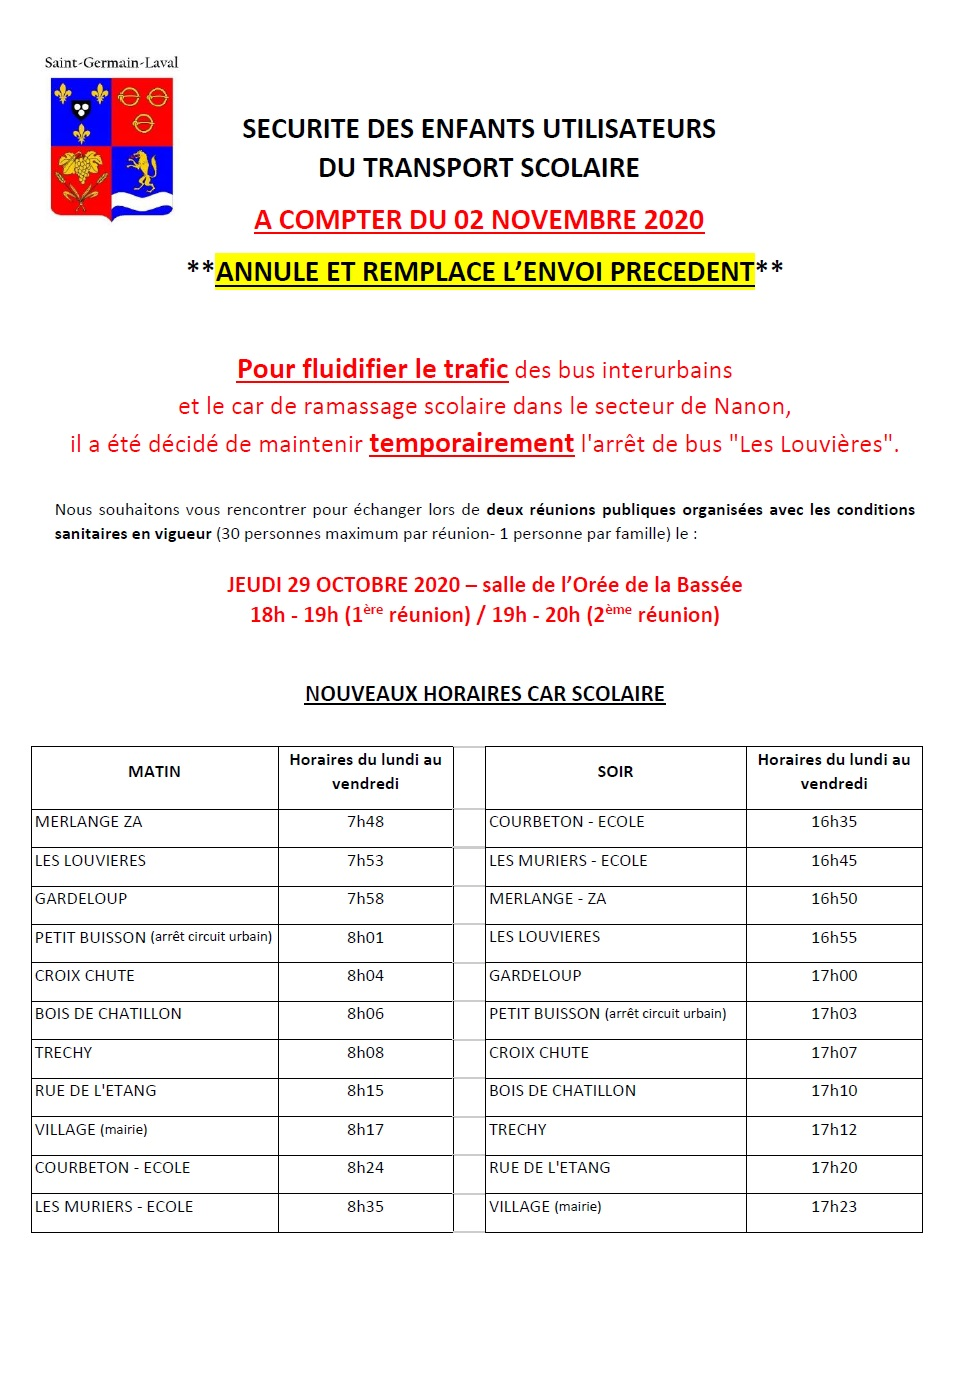 Horaires bus 02-11-2020